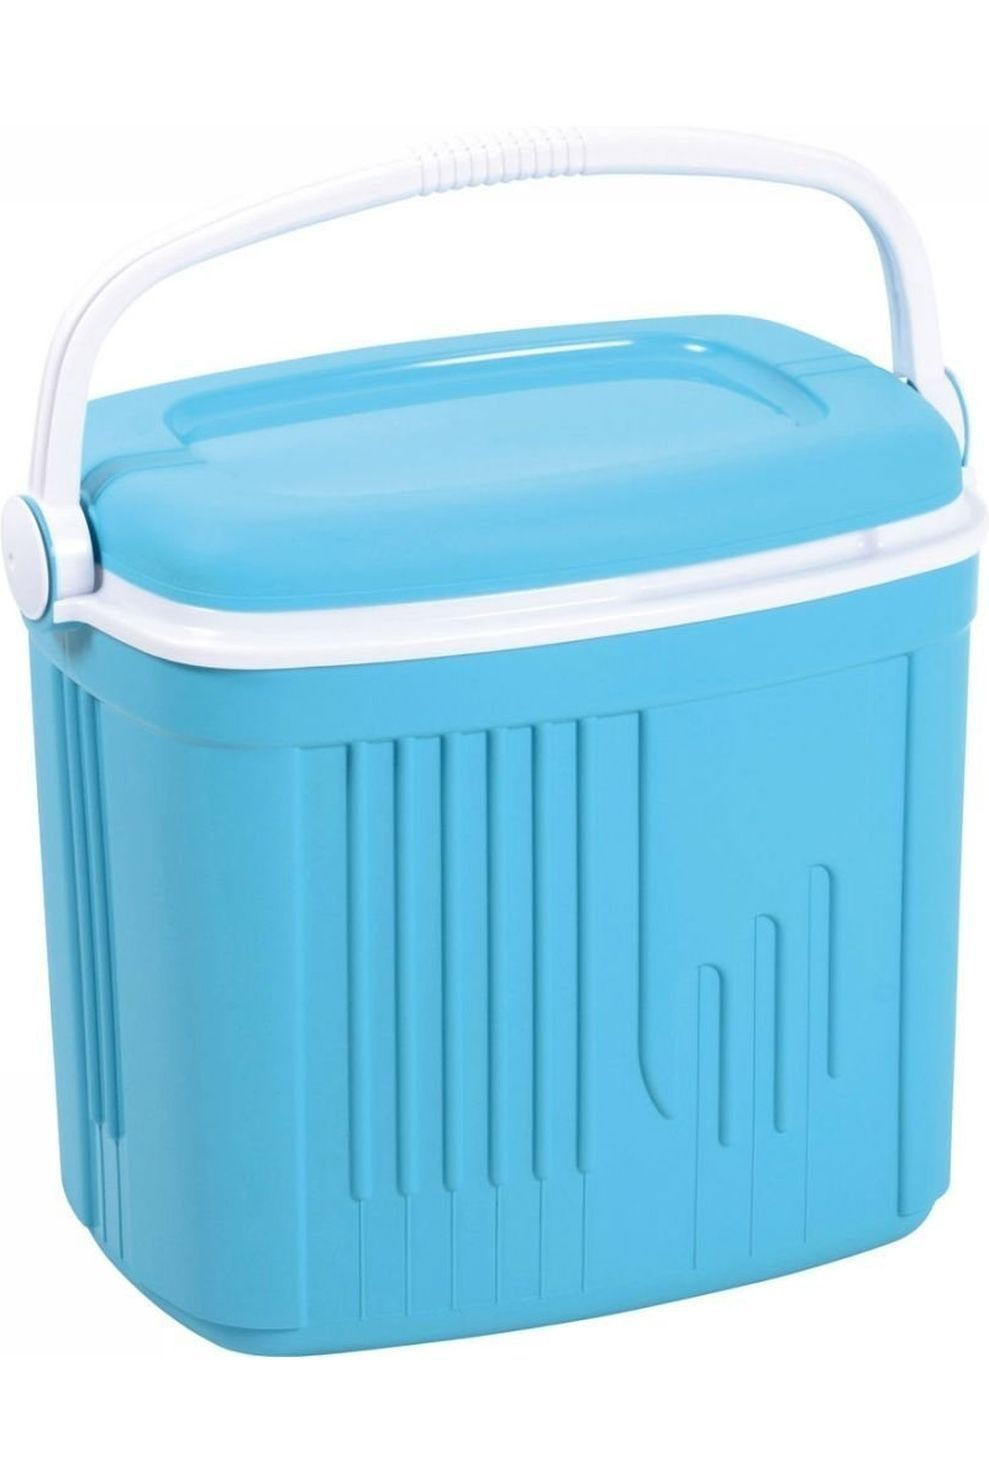 Eda Koeltas Iceberg 32 Liter - Blauw